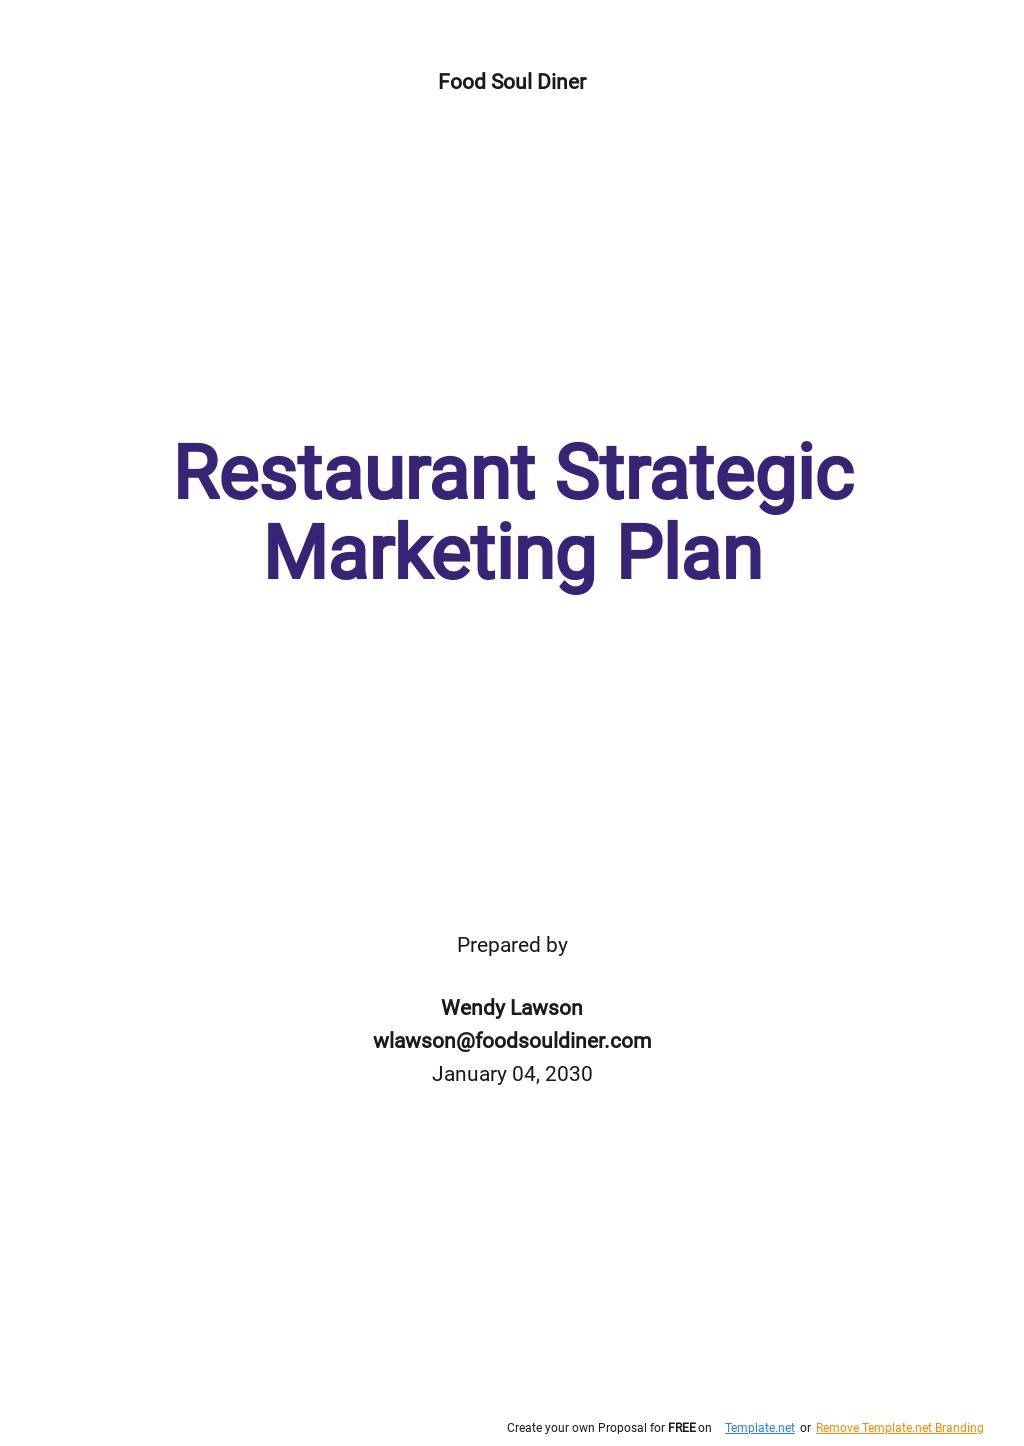 Restaurant Strategic Marketing Plan Template.jpe